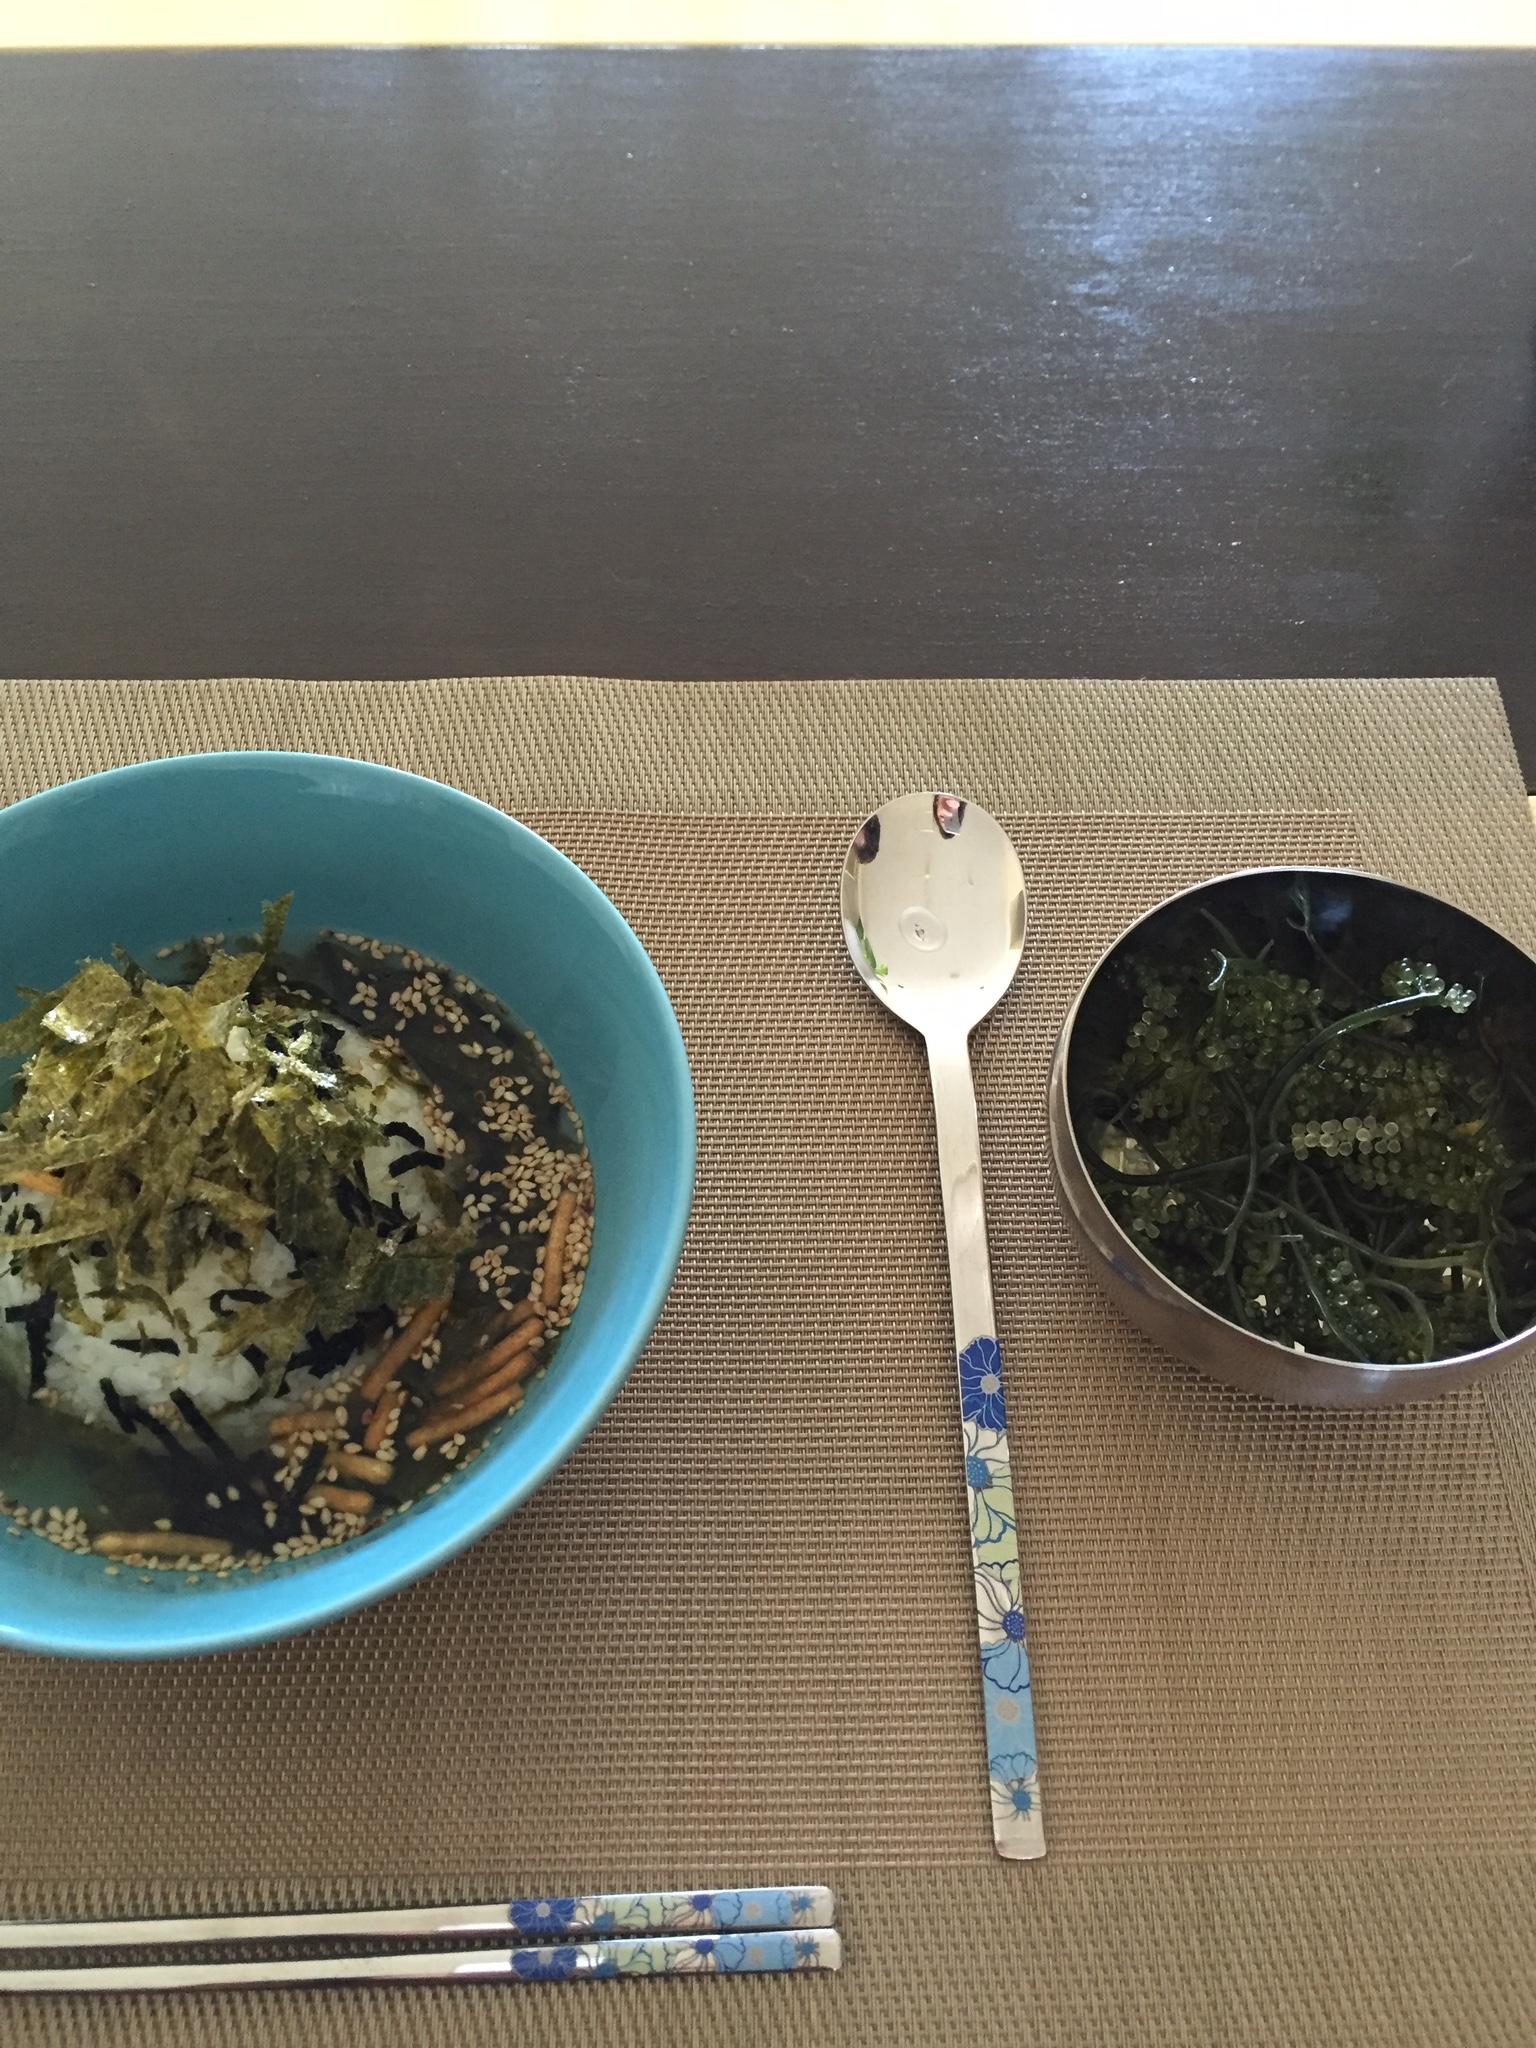 Japanese breakfast courtesy of our host Imran!